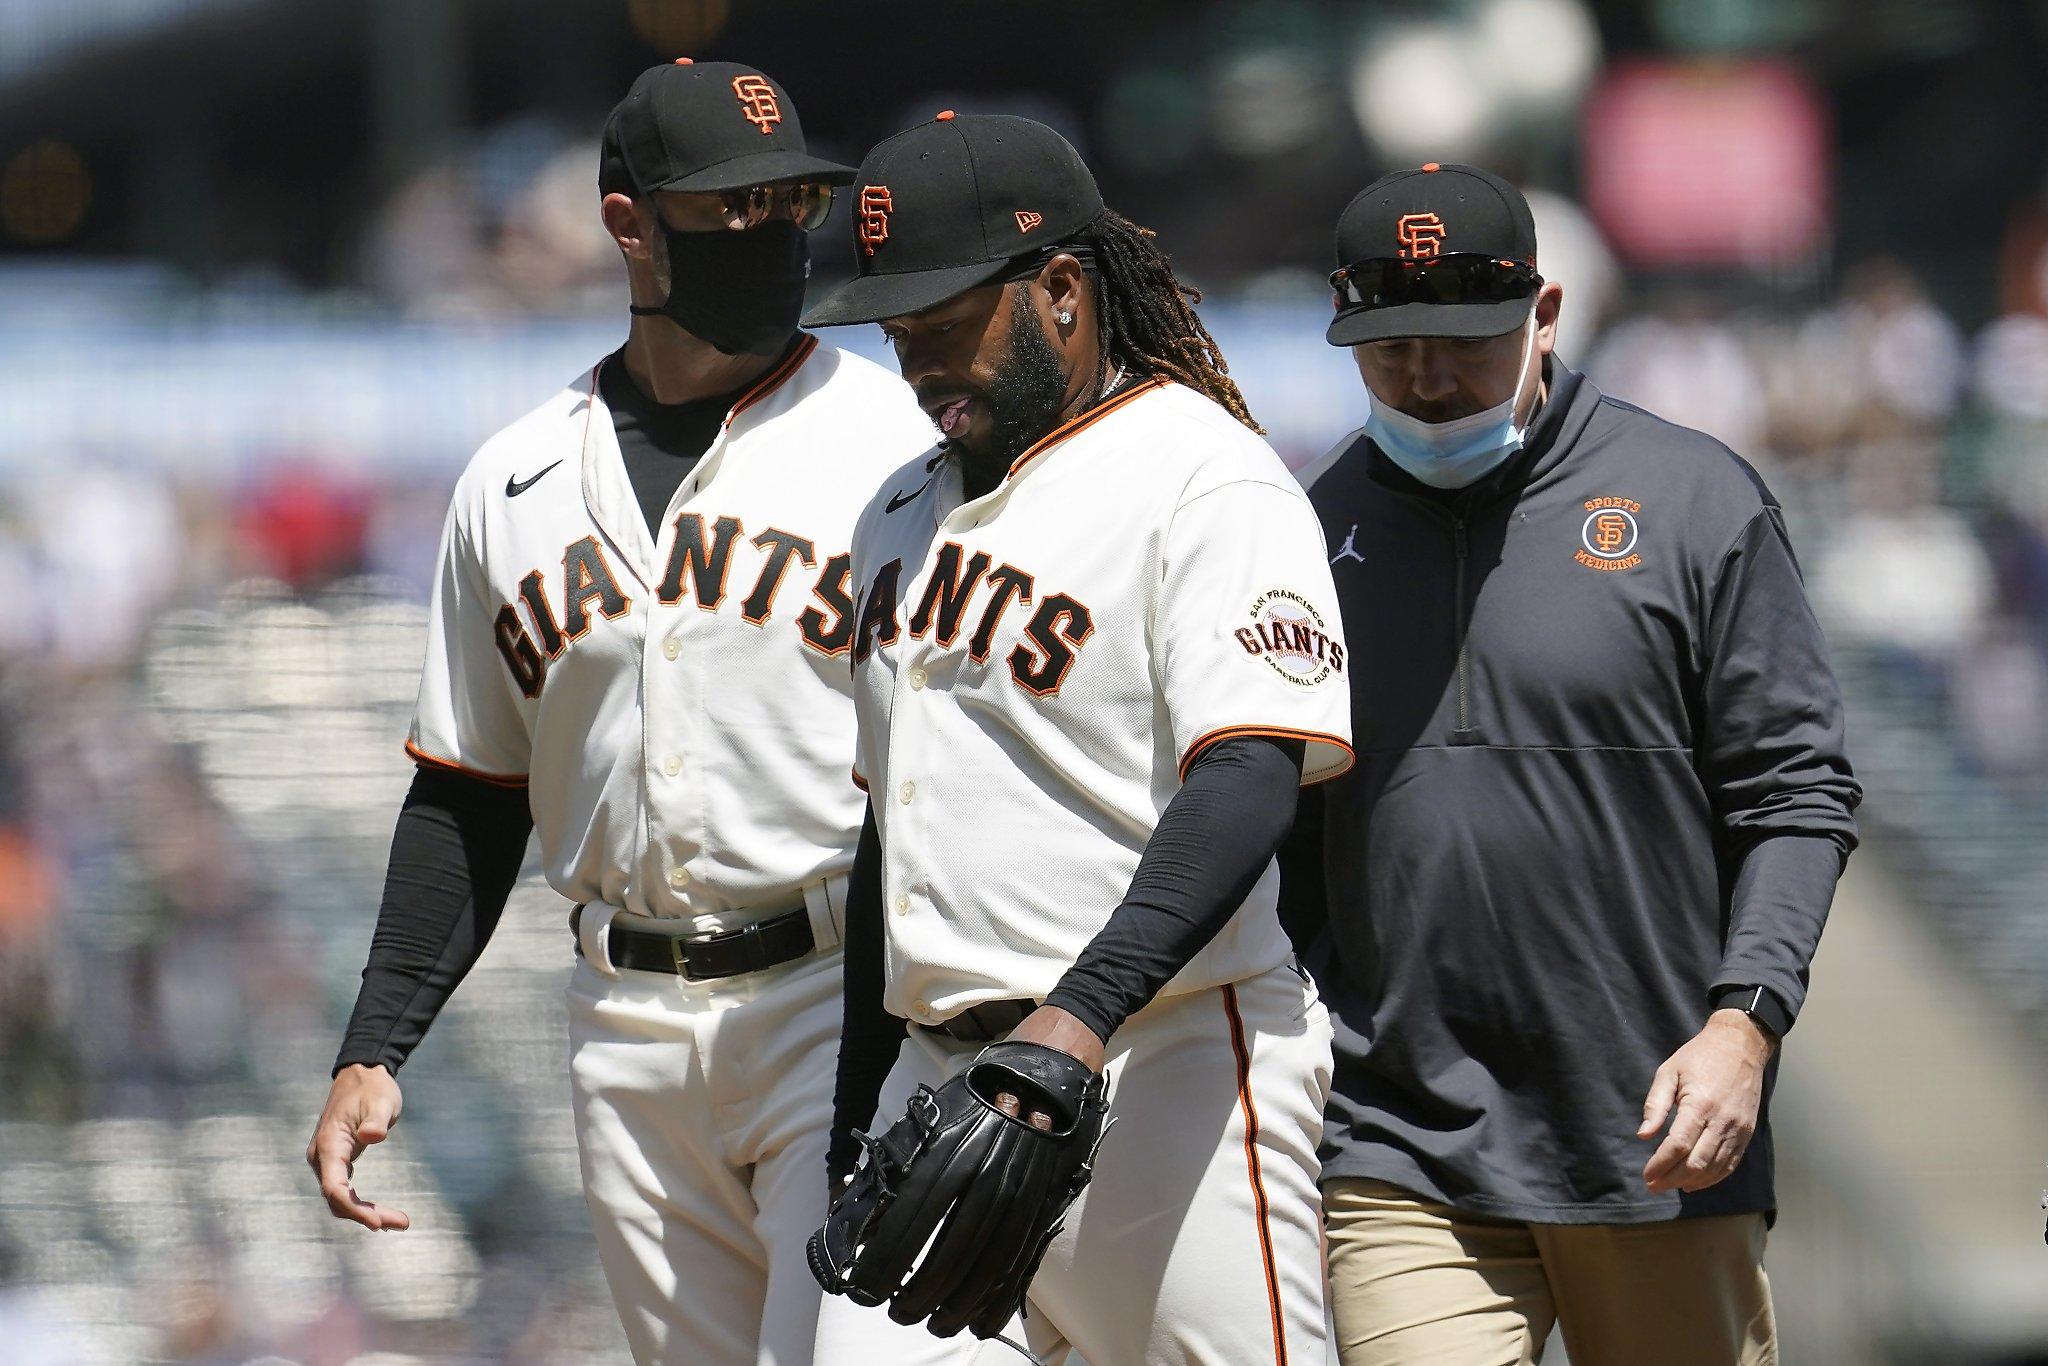 Giants' Johnny Cueto headed to injured list: grade 1 lat strain